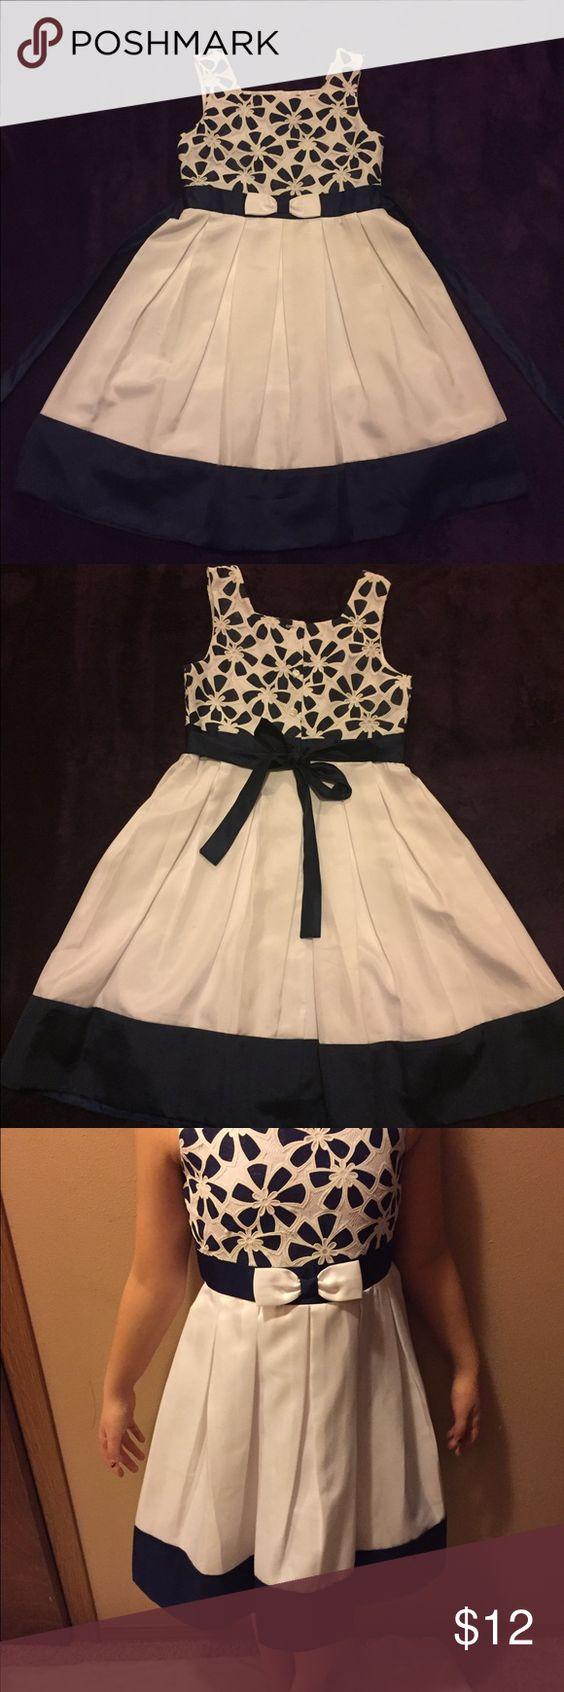 Girls flower dress blues white flowers and girls girls flower dress knee length navy blue and white flower dress jona michelle dresses izmirmasajfo